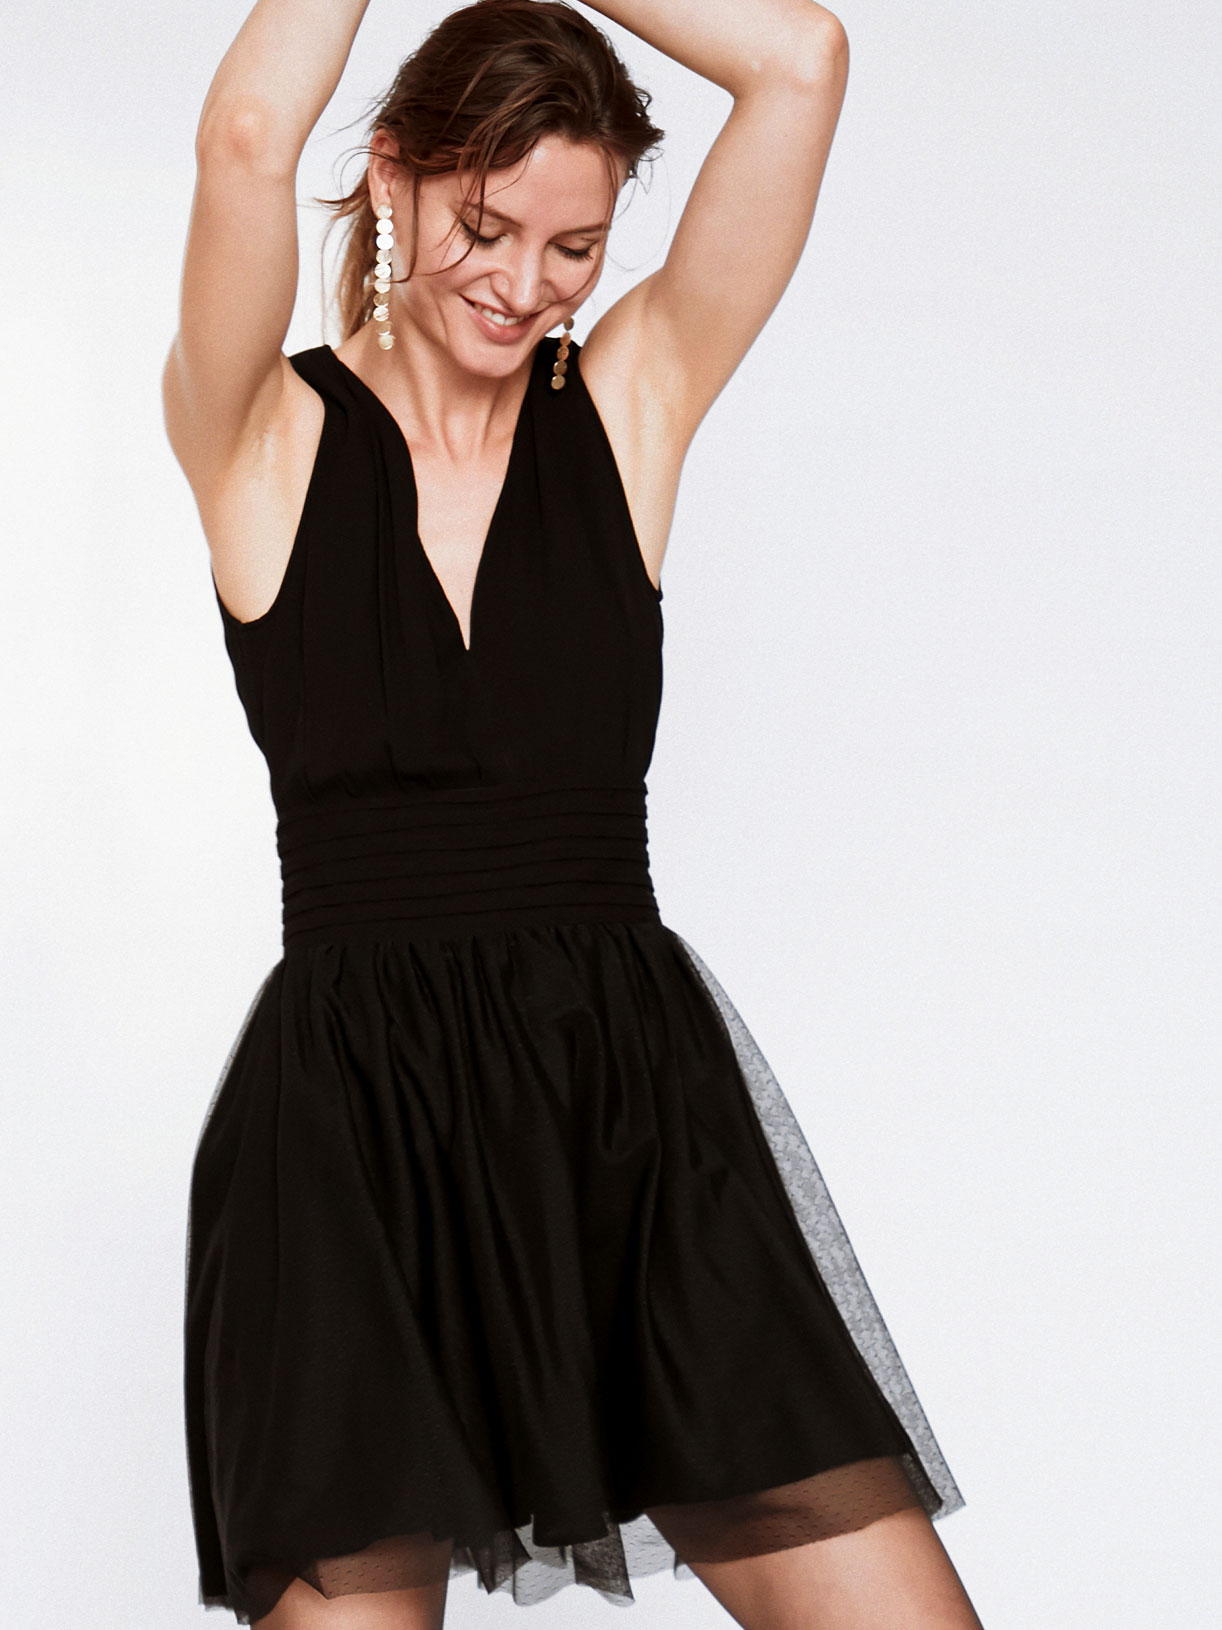 Marie - Robe noire courte